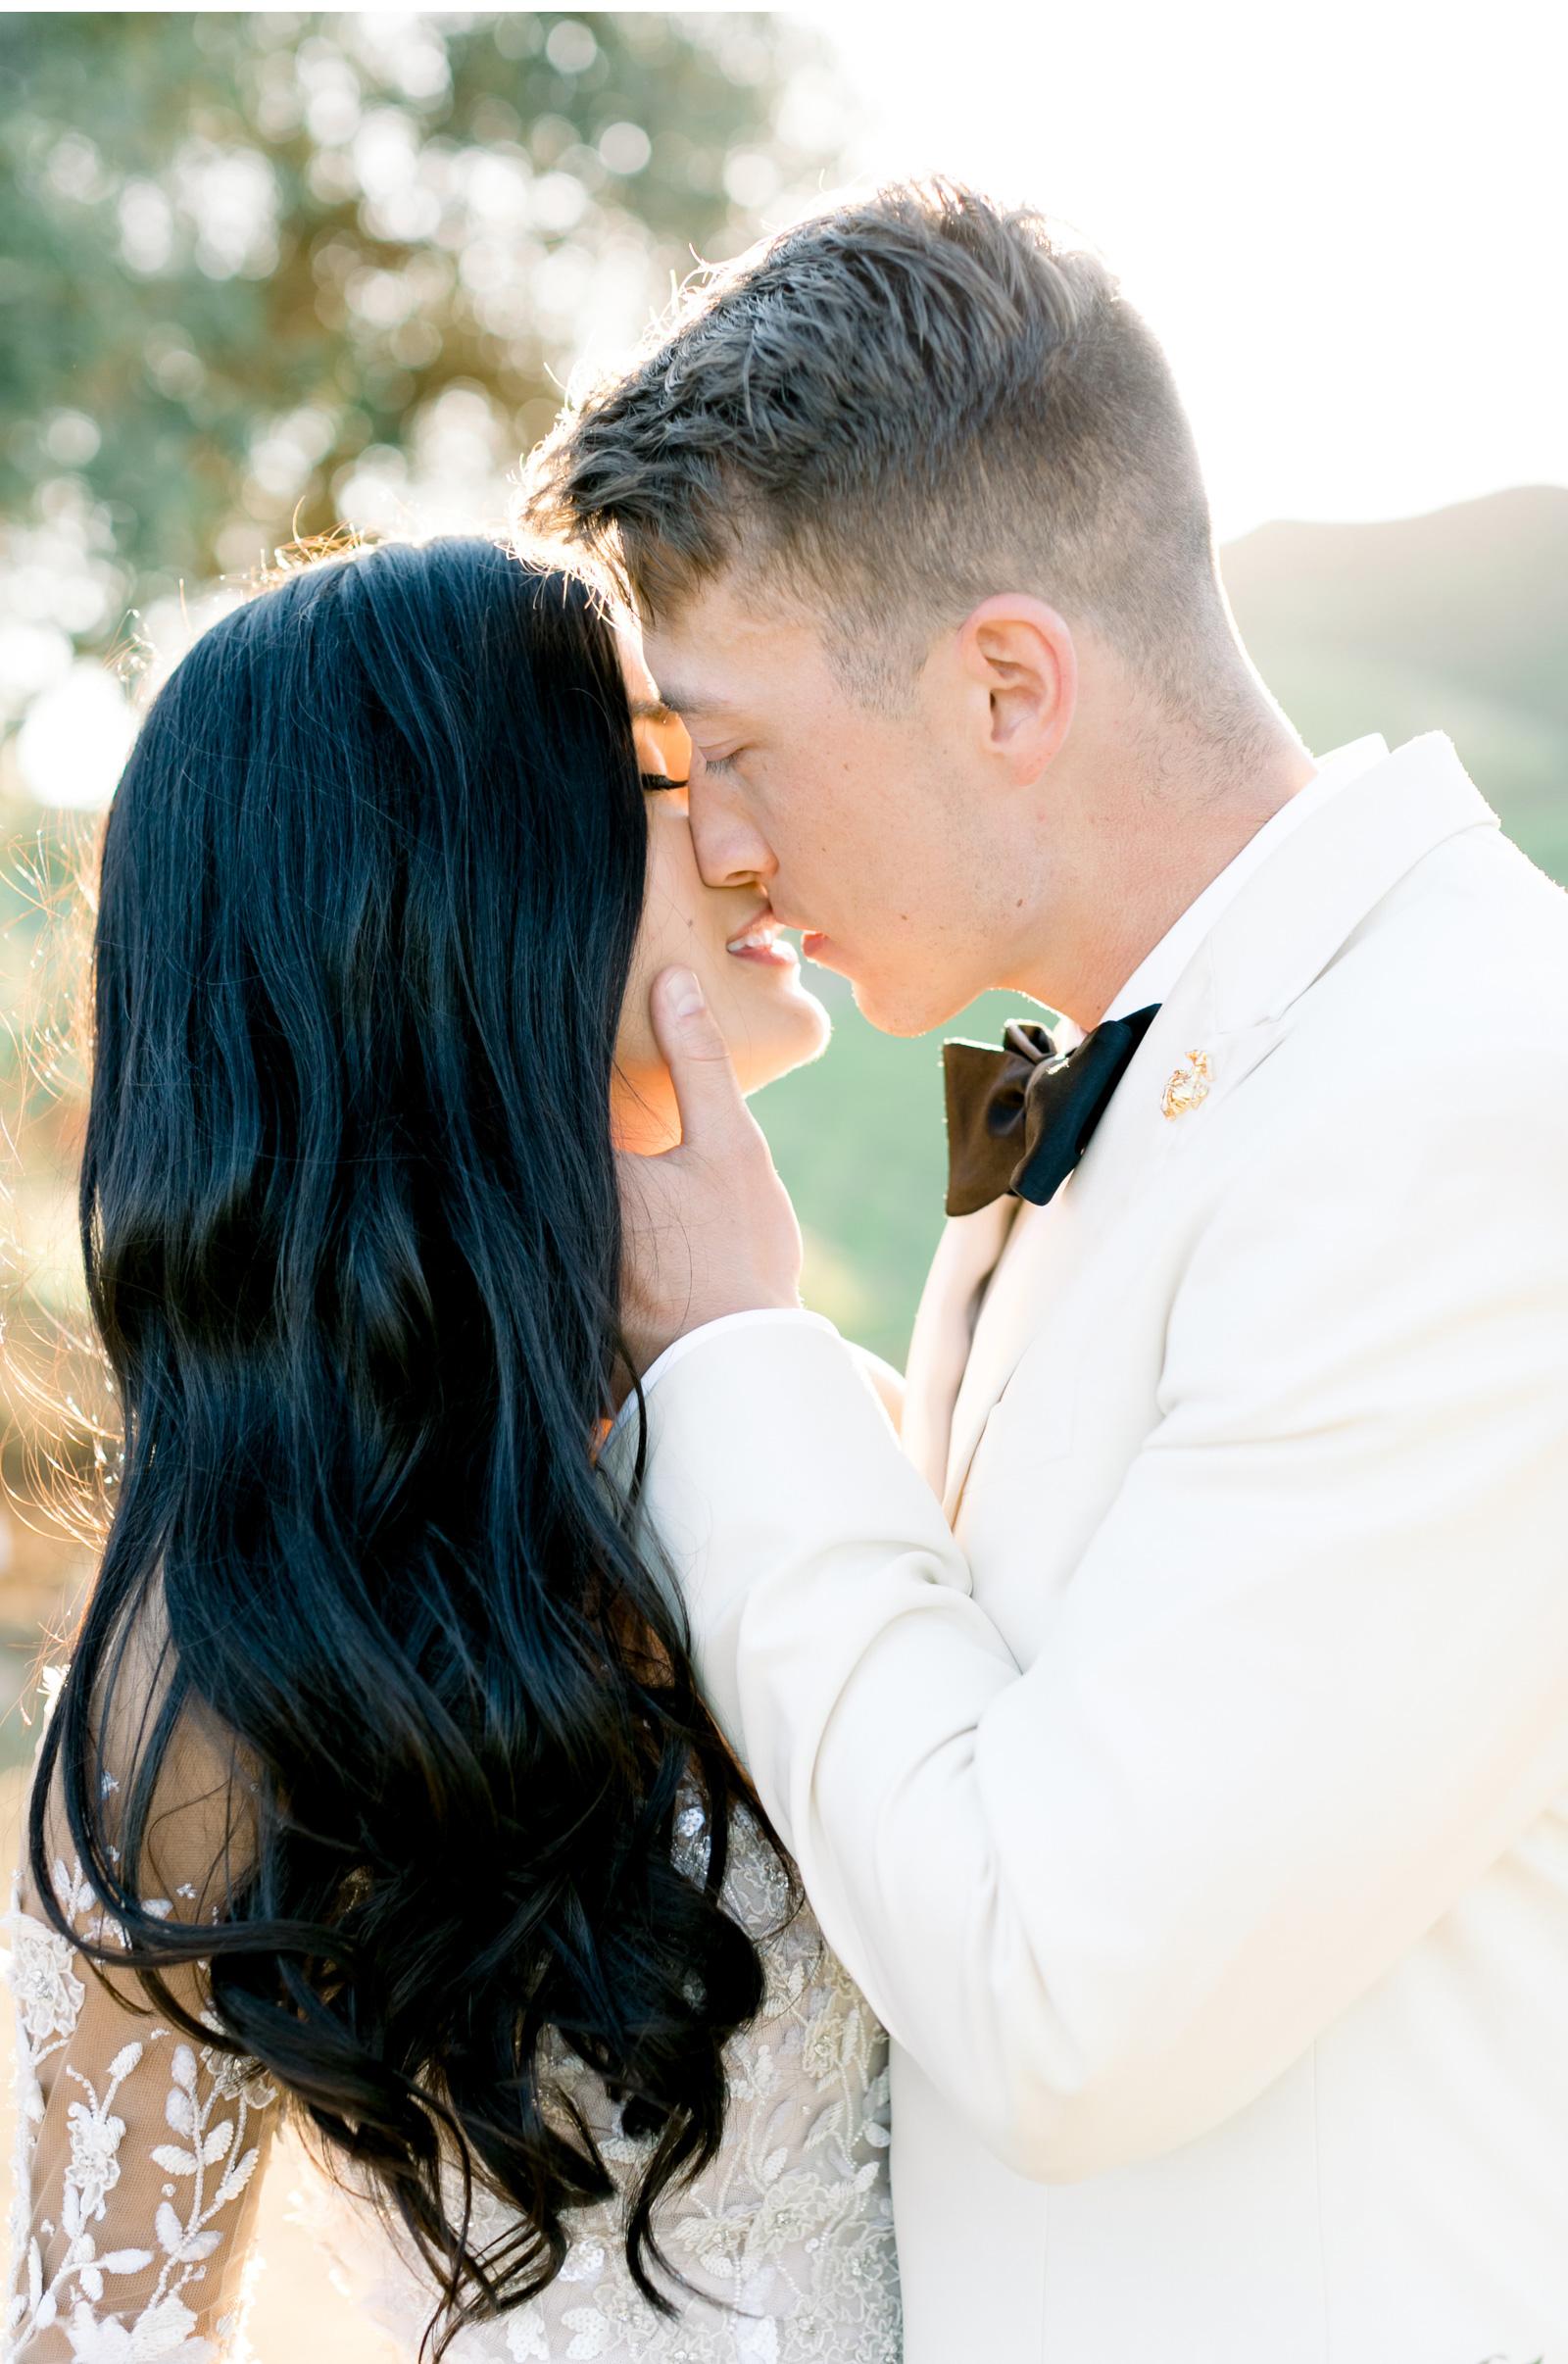 Style-Me-Pretty-Malibu-Wedding-Venues-Southern-California-Wedding-Photographer-Triunfo-Creek-Malibu-Photographer-Natalie-Schutt-Photography_06.jpg